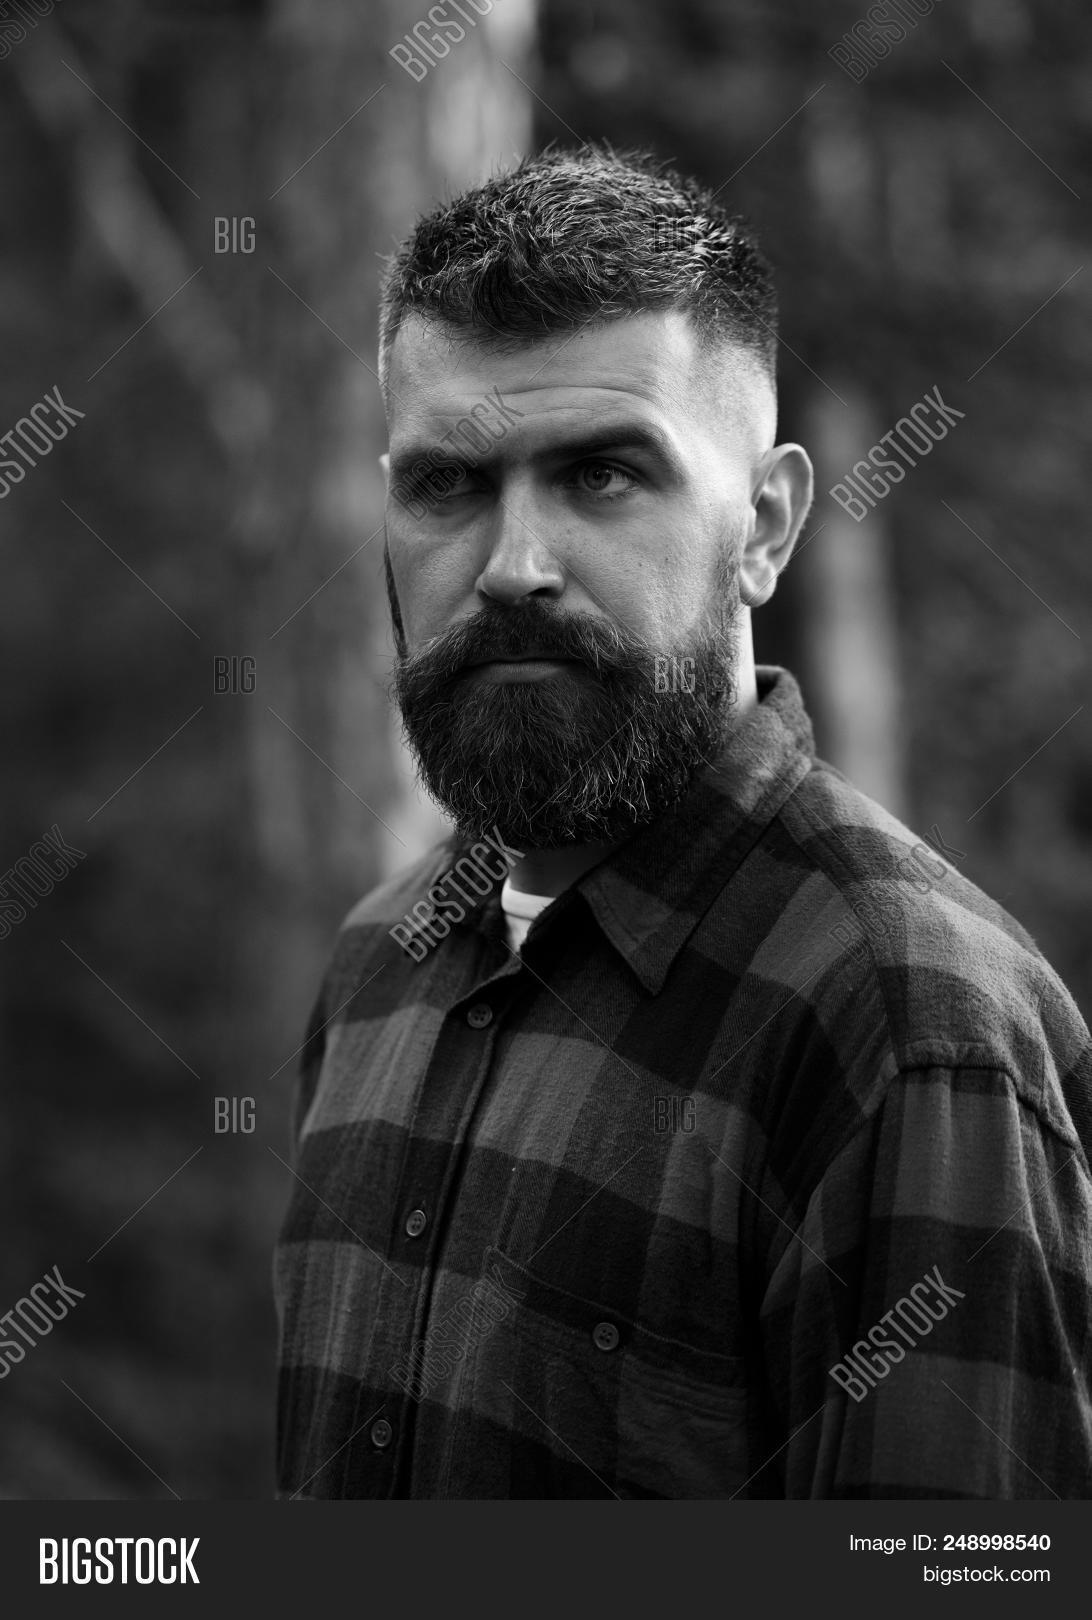 Phenomenal Man Strict Face Beard Image Photo Free Trial Bigstock Natural Hairstyles Runnerswayorg